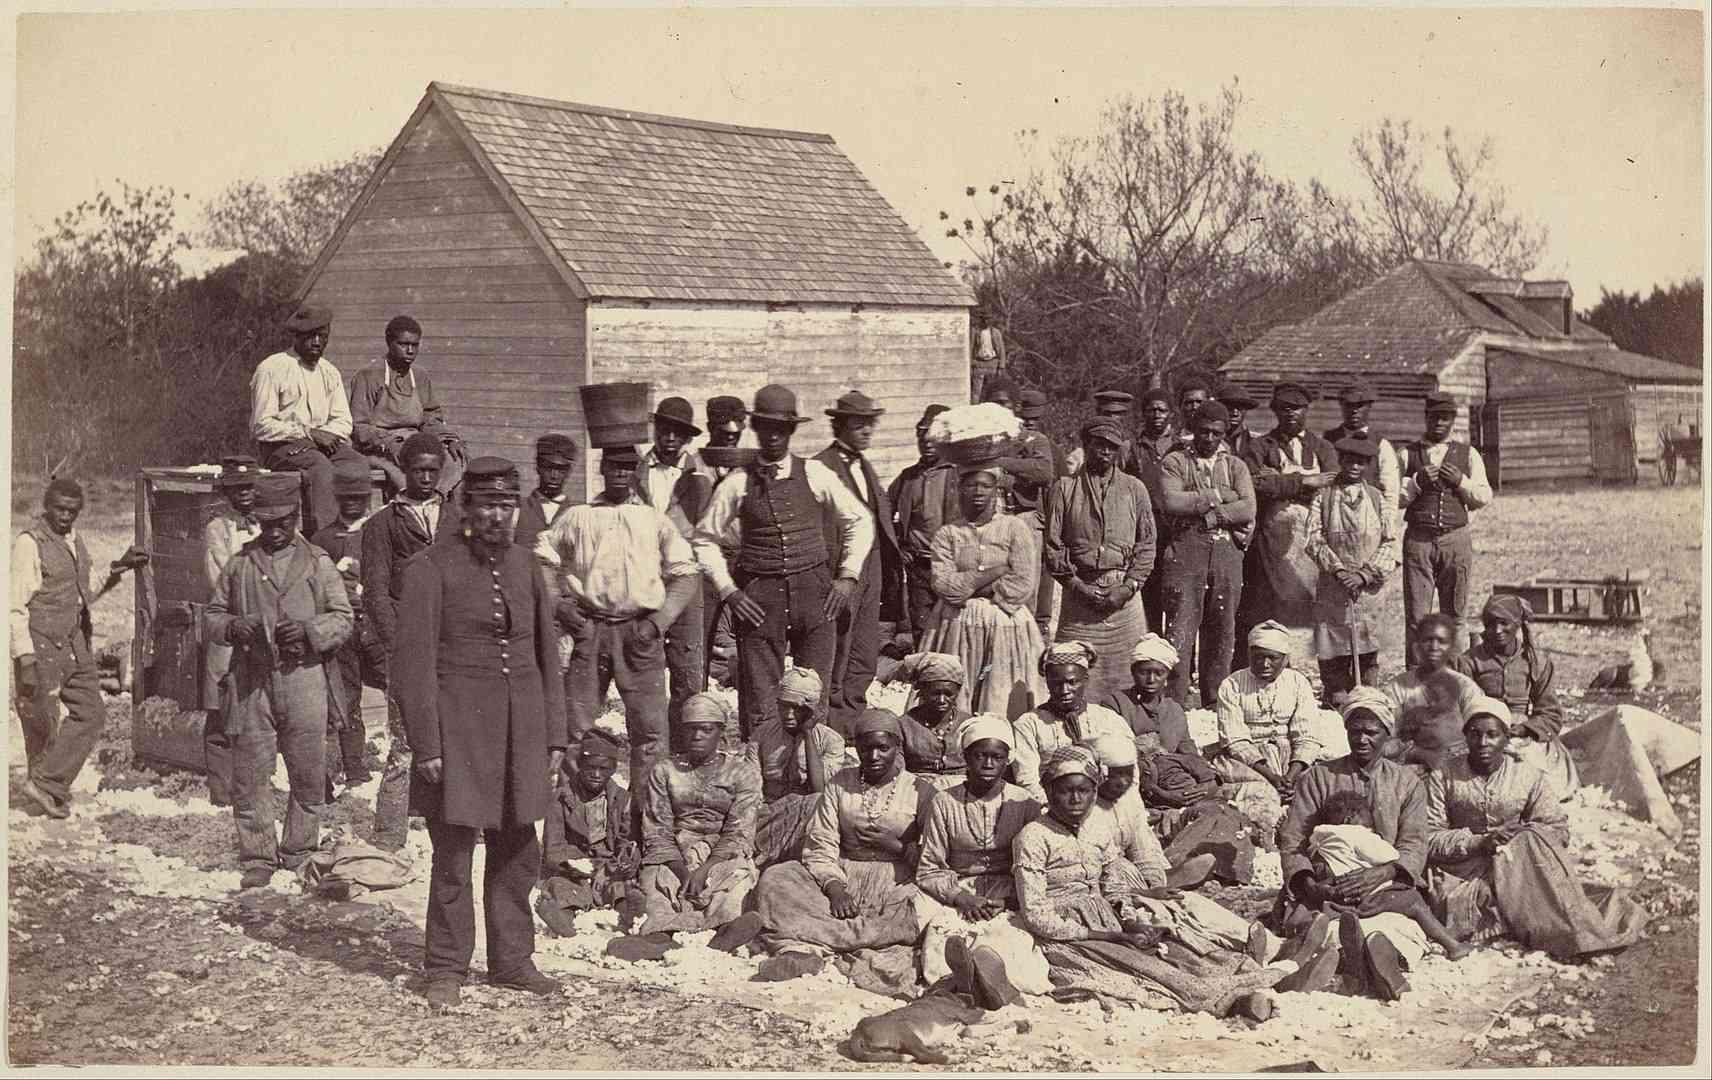 Photograph of slaves on a plantation